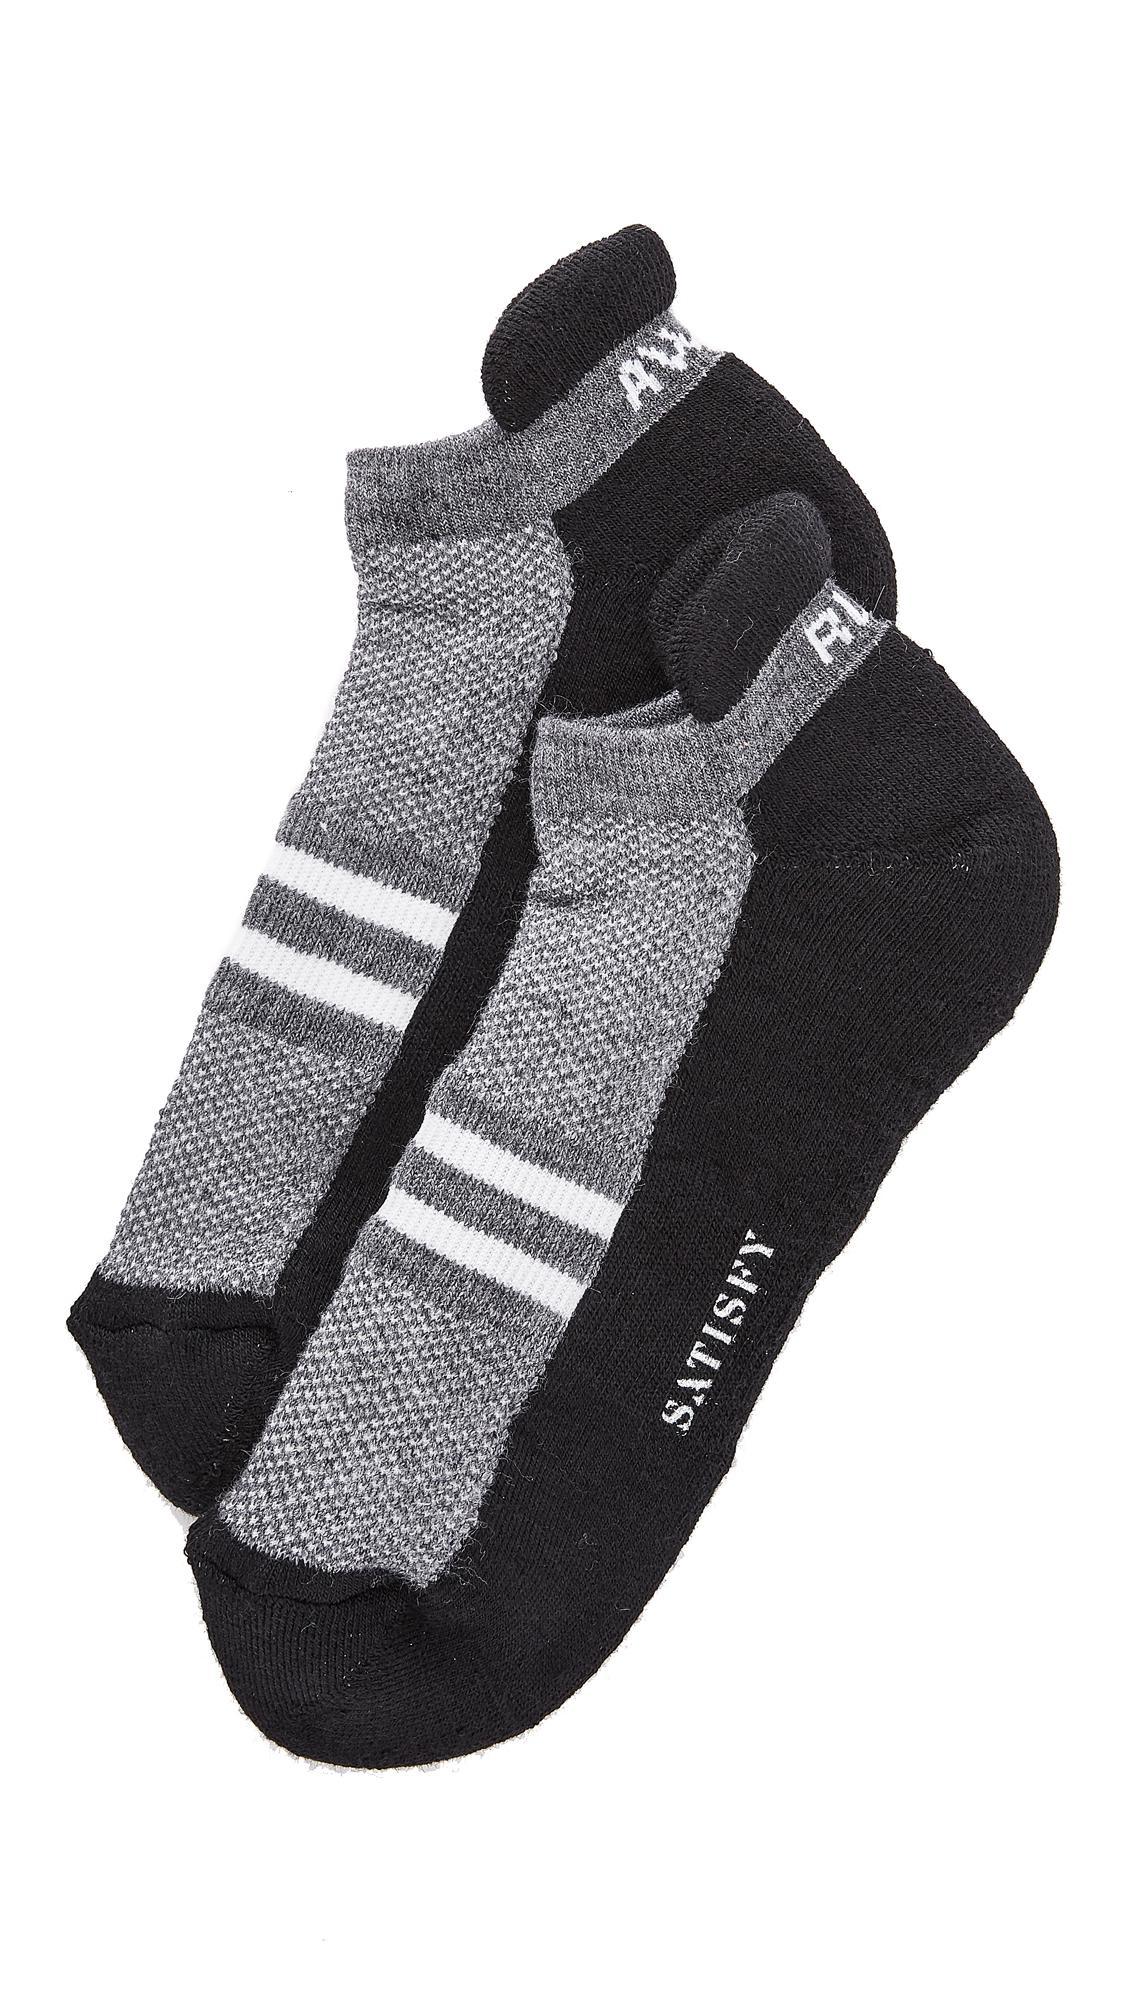 Satisfy Patchwork Ankle Socks In Black